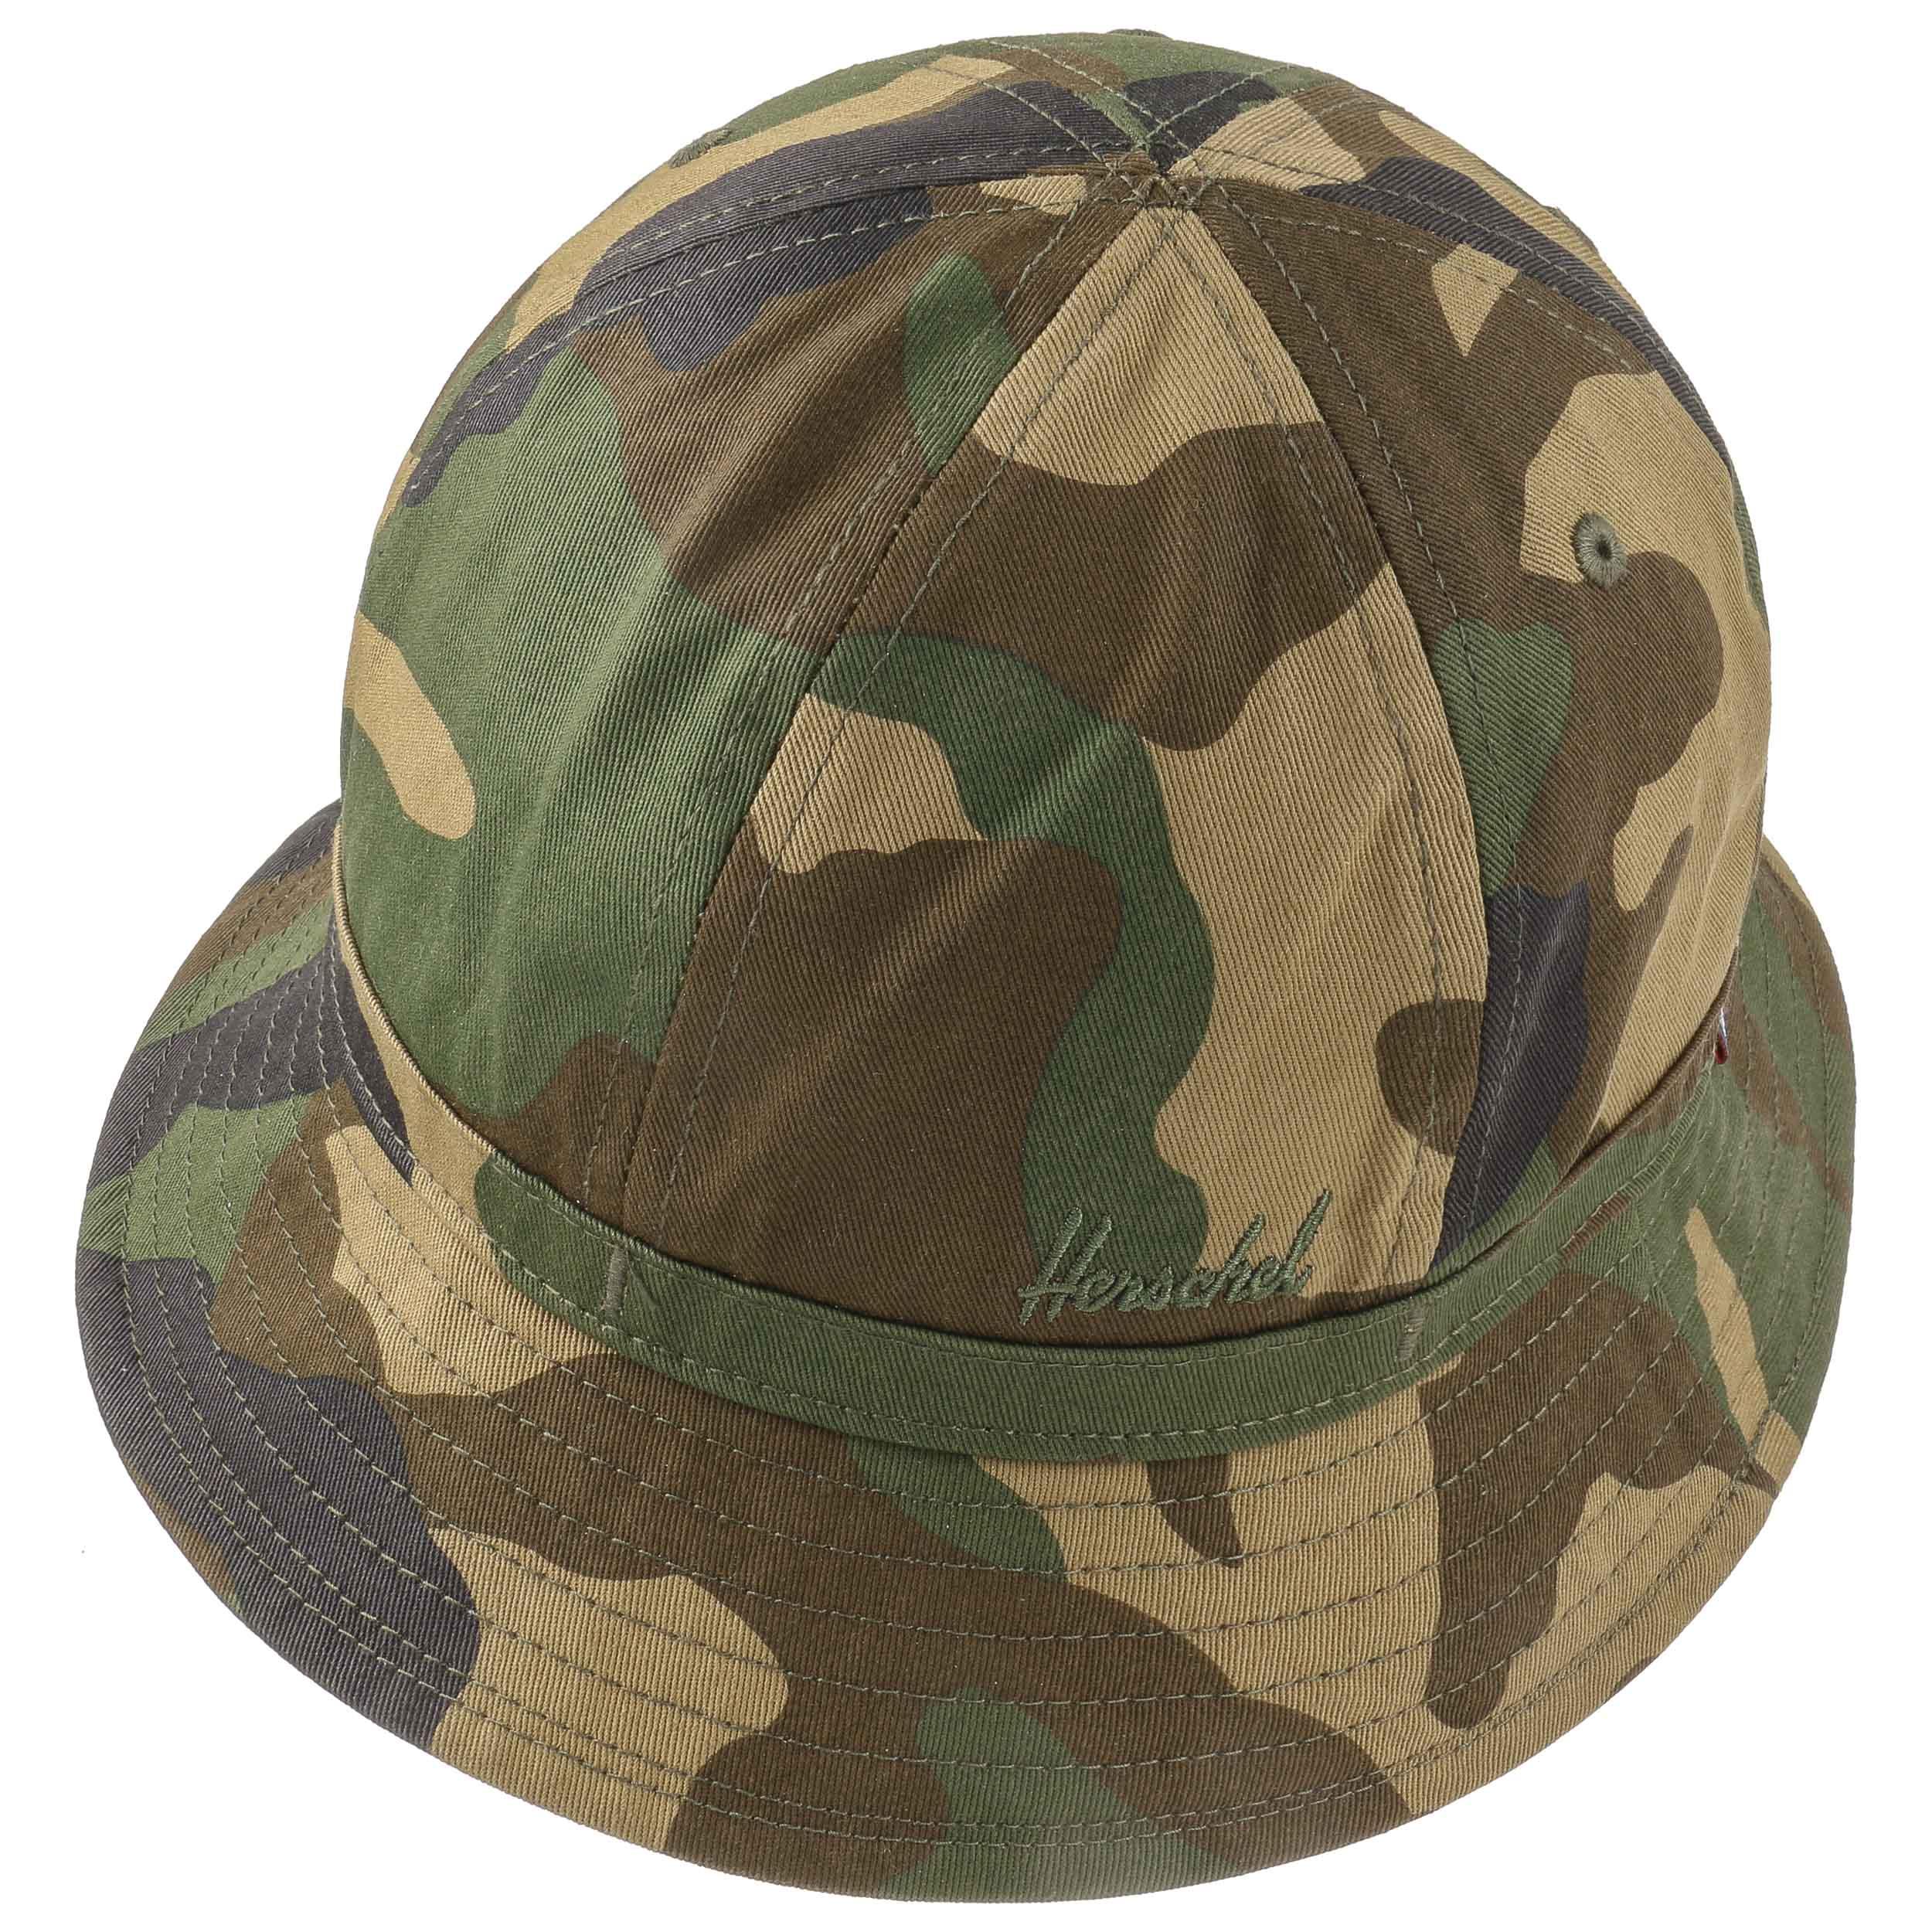 ccbbfa5680ac Cooperman Pattern Bucket Hat by Herschel - camouflage 1 ...